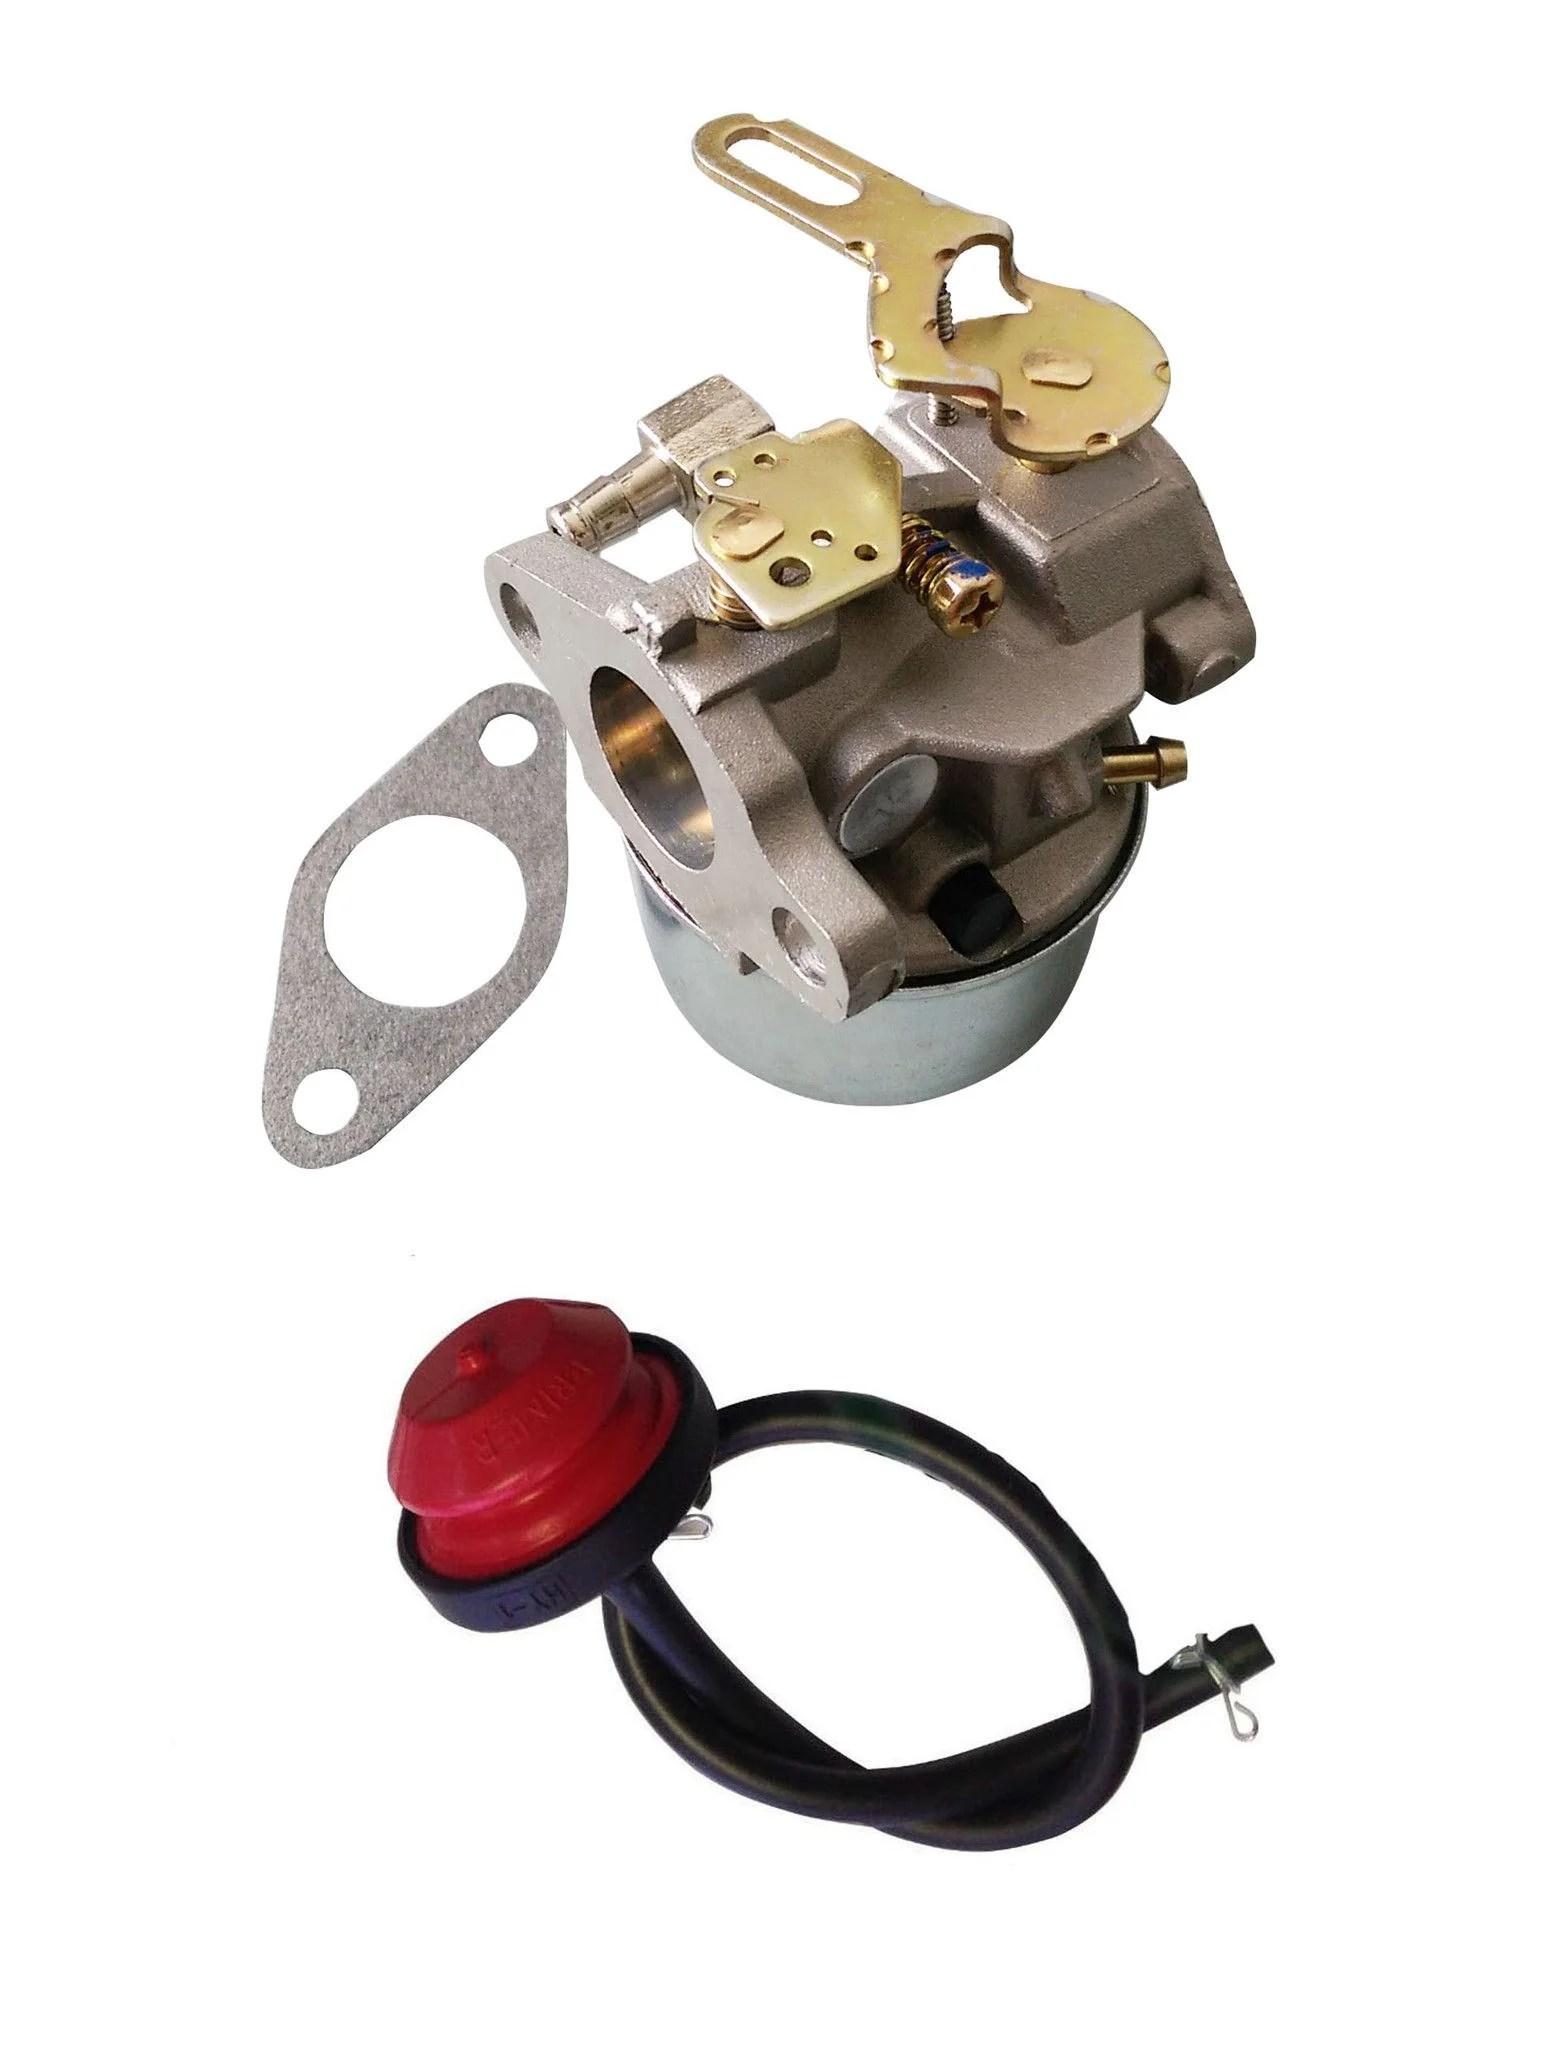 everest carburetor with primer bulb fits toro snowblower usa everest parts supplies [ 1555 x 2048 Pixel ]